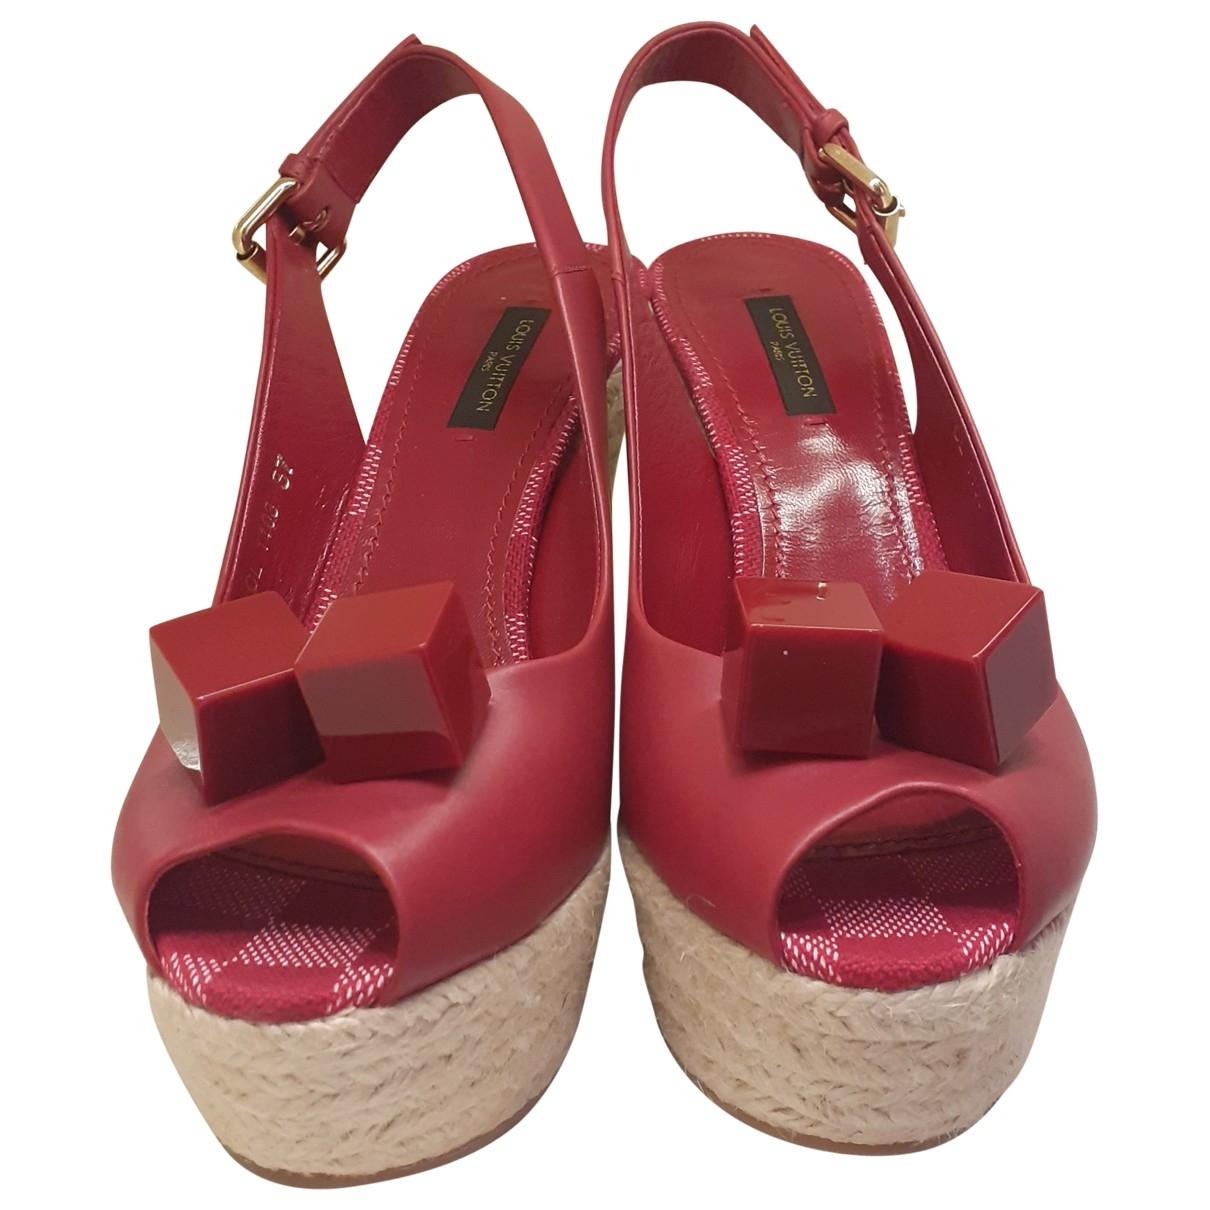 Louis Vuitton \N Espadrilles in  Rot Leder